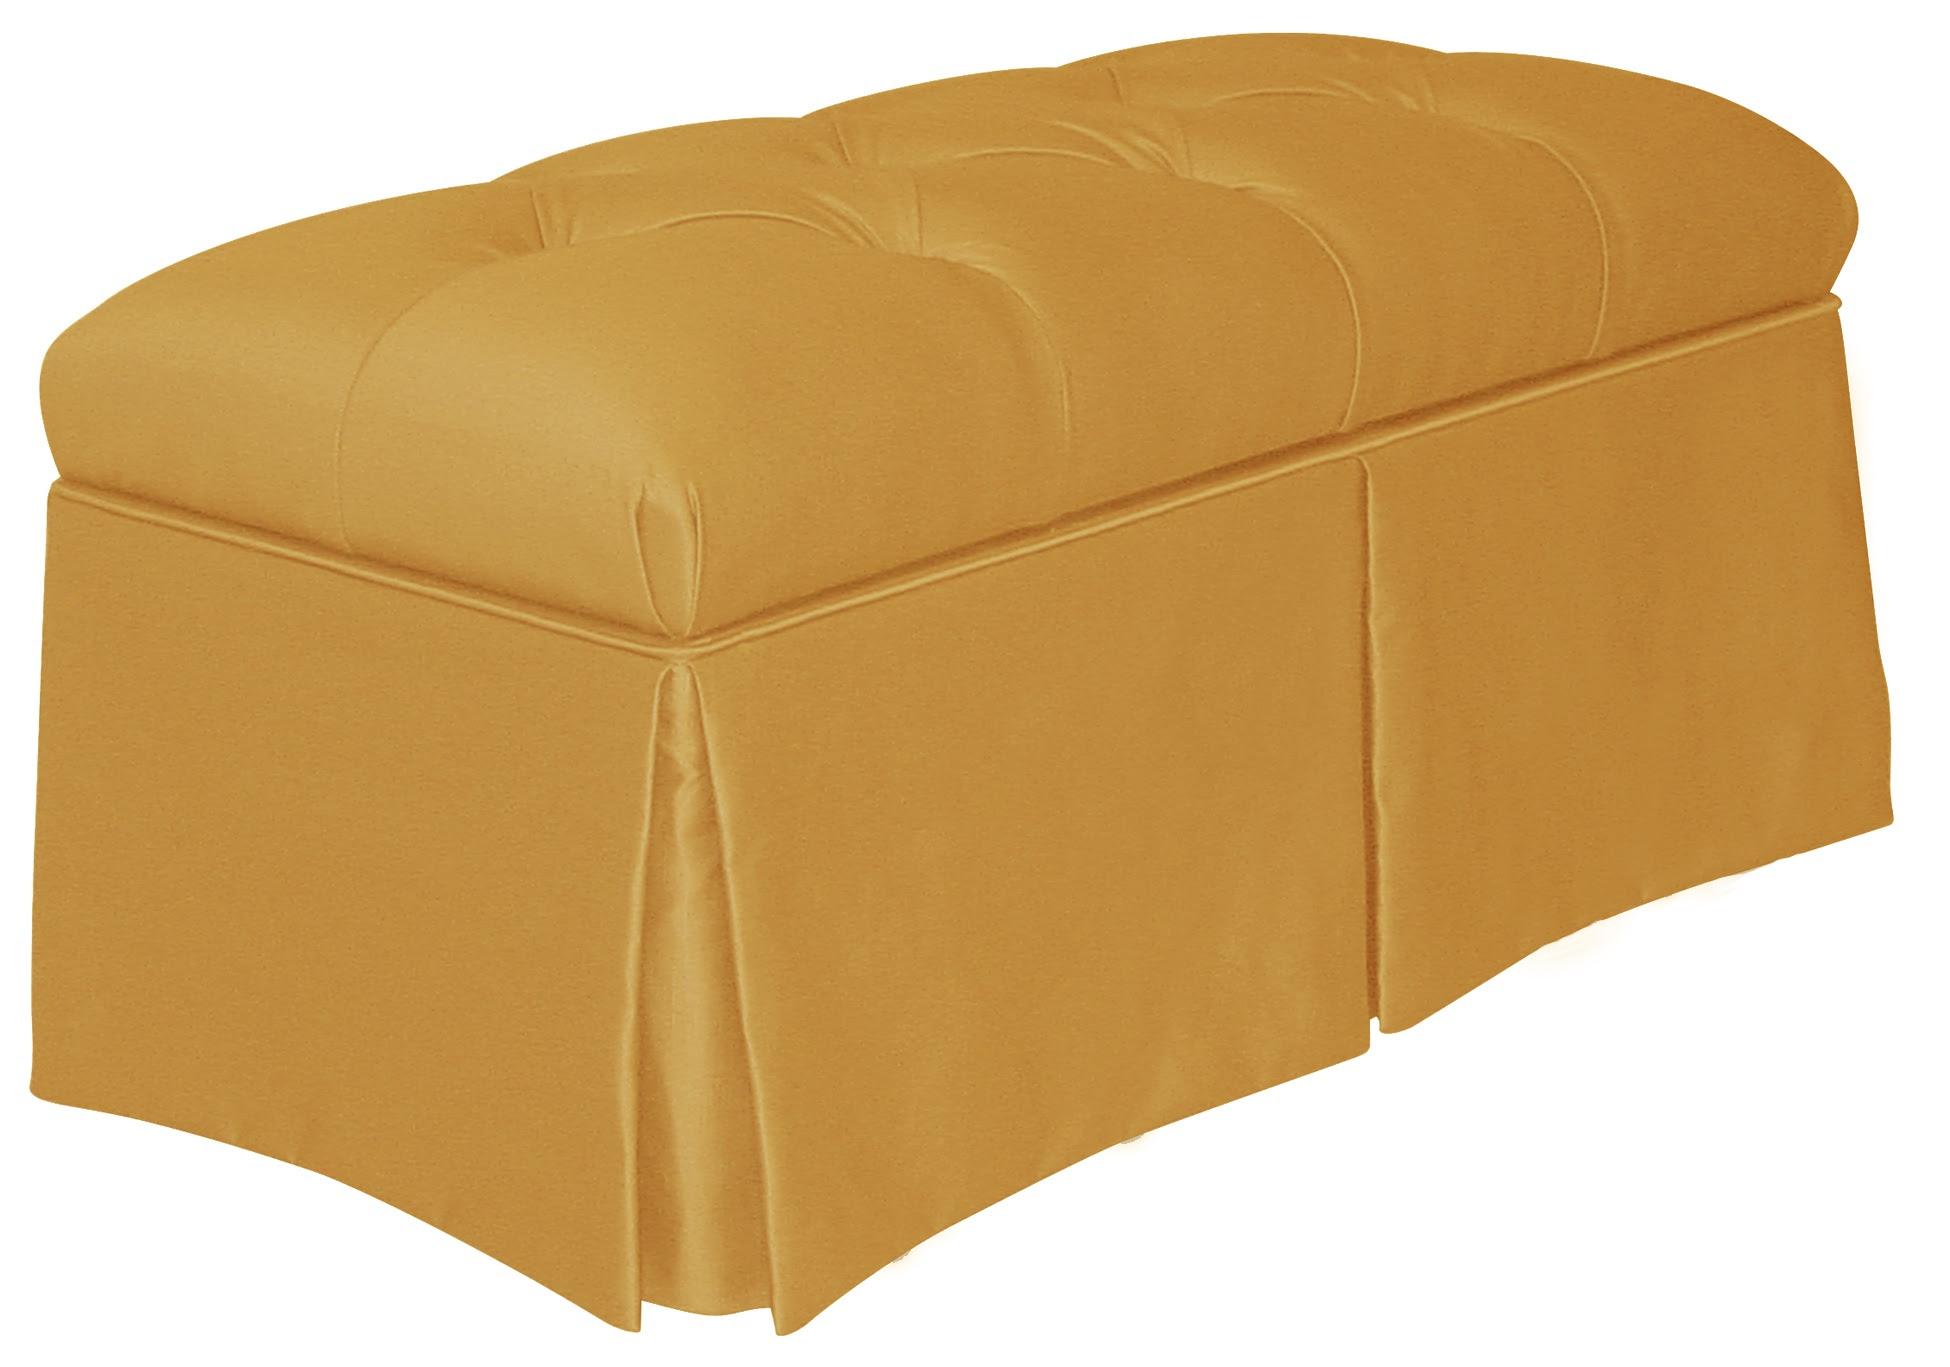 Furniture > Living Room Furniture > Bench > Aztec Bench